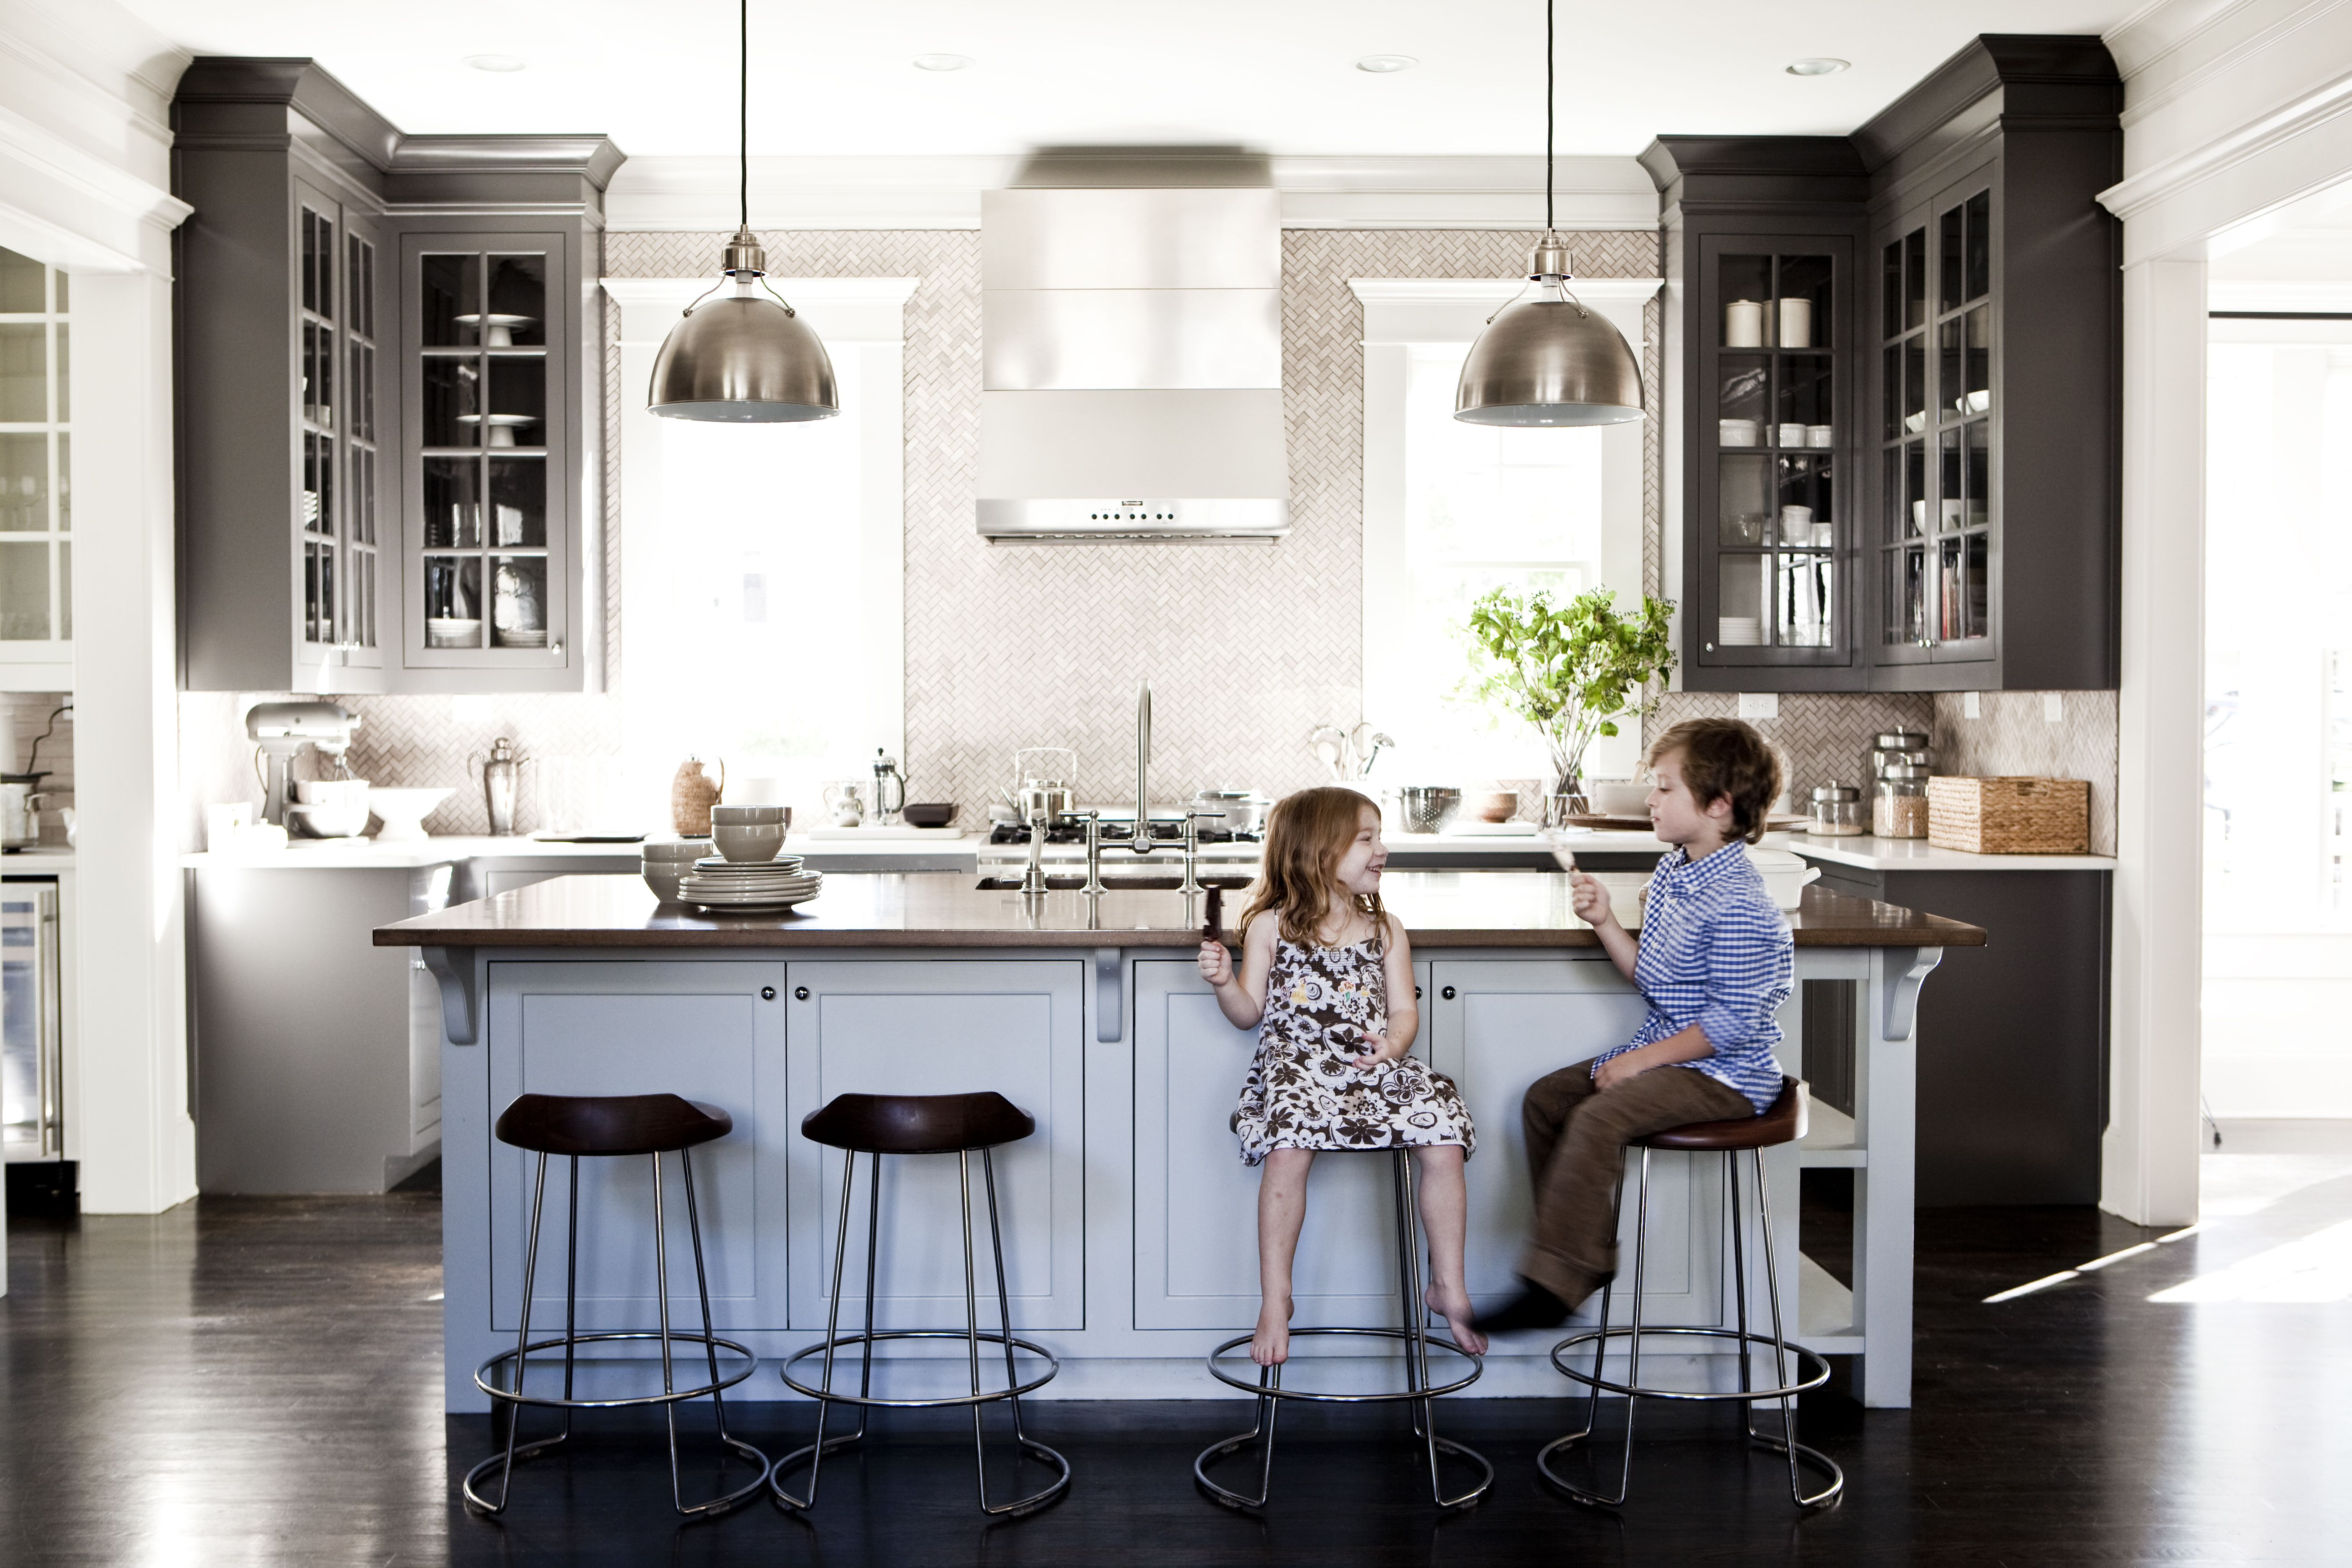 The 7 Best Kitchen Lights Of 2020